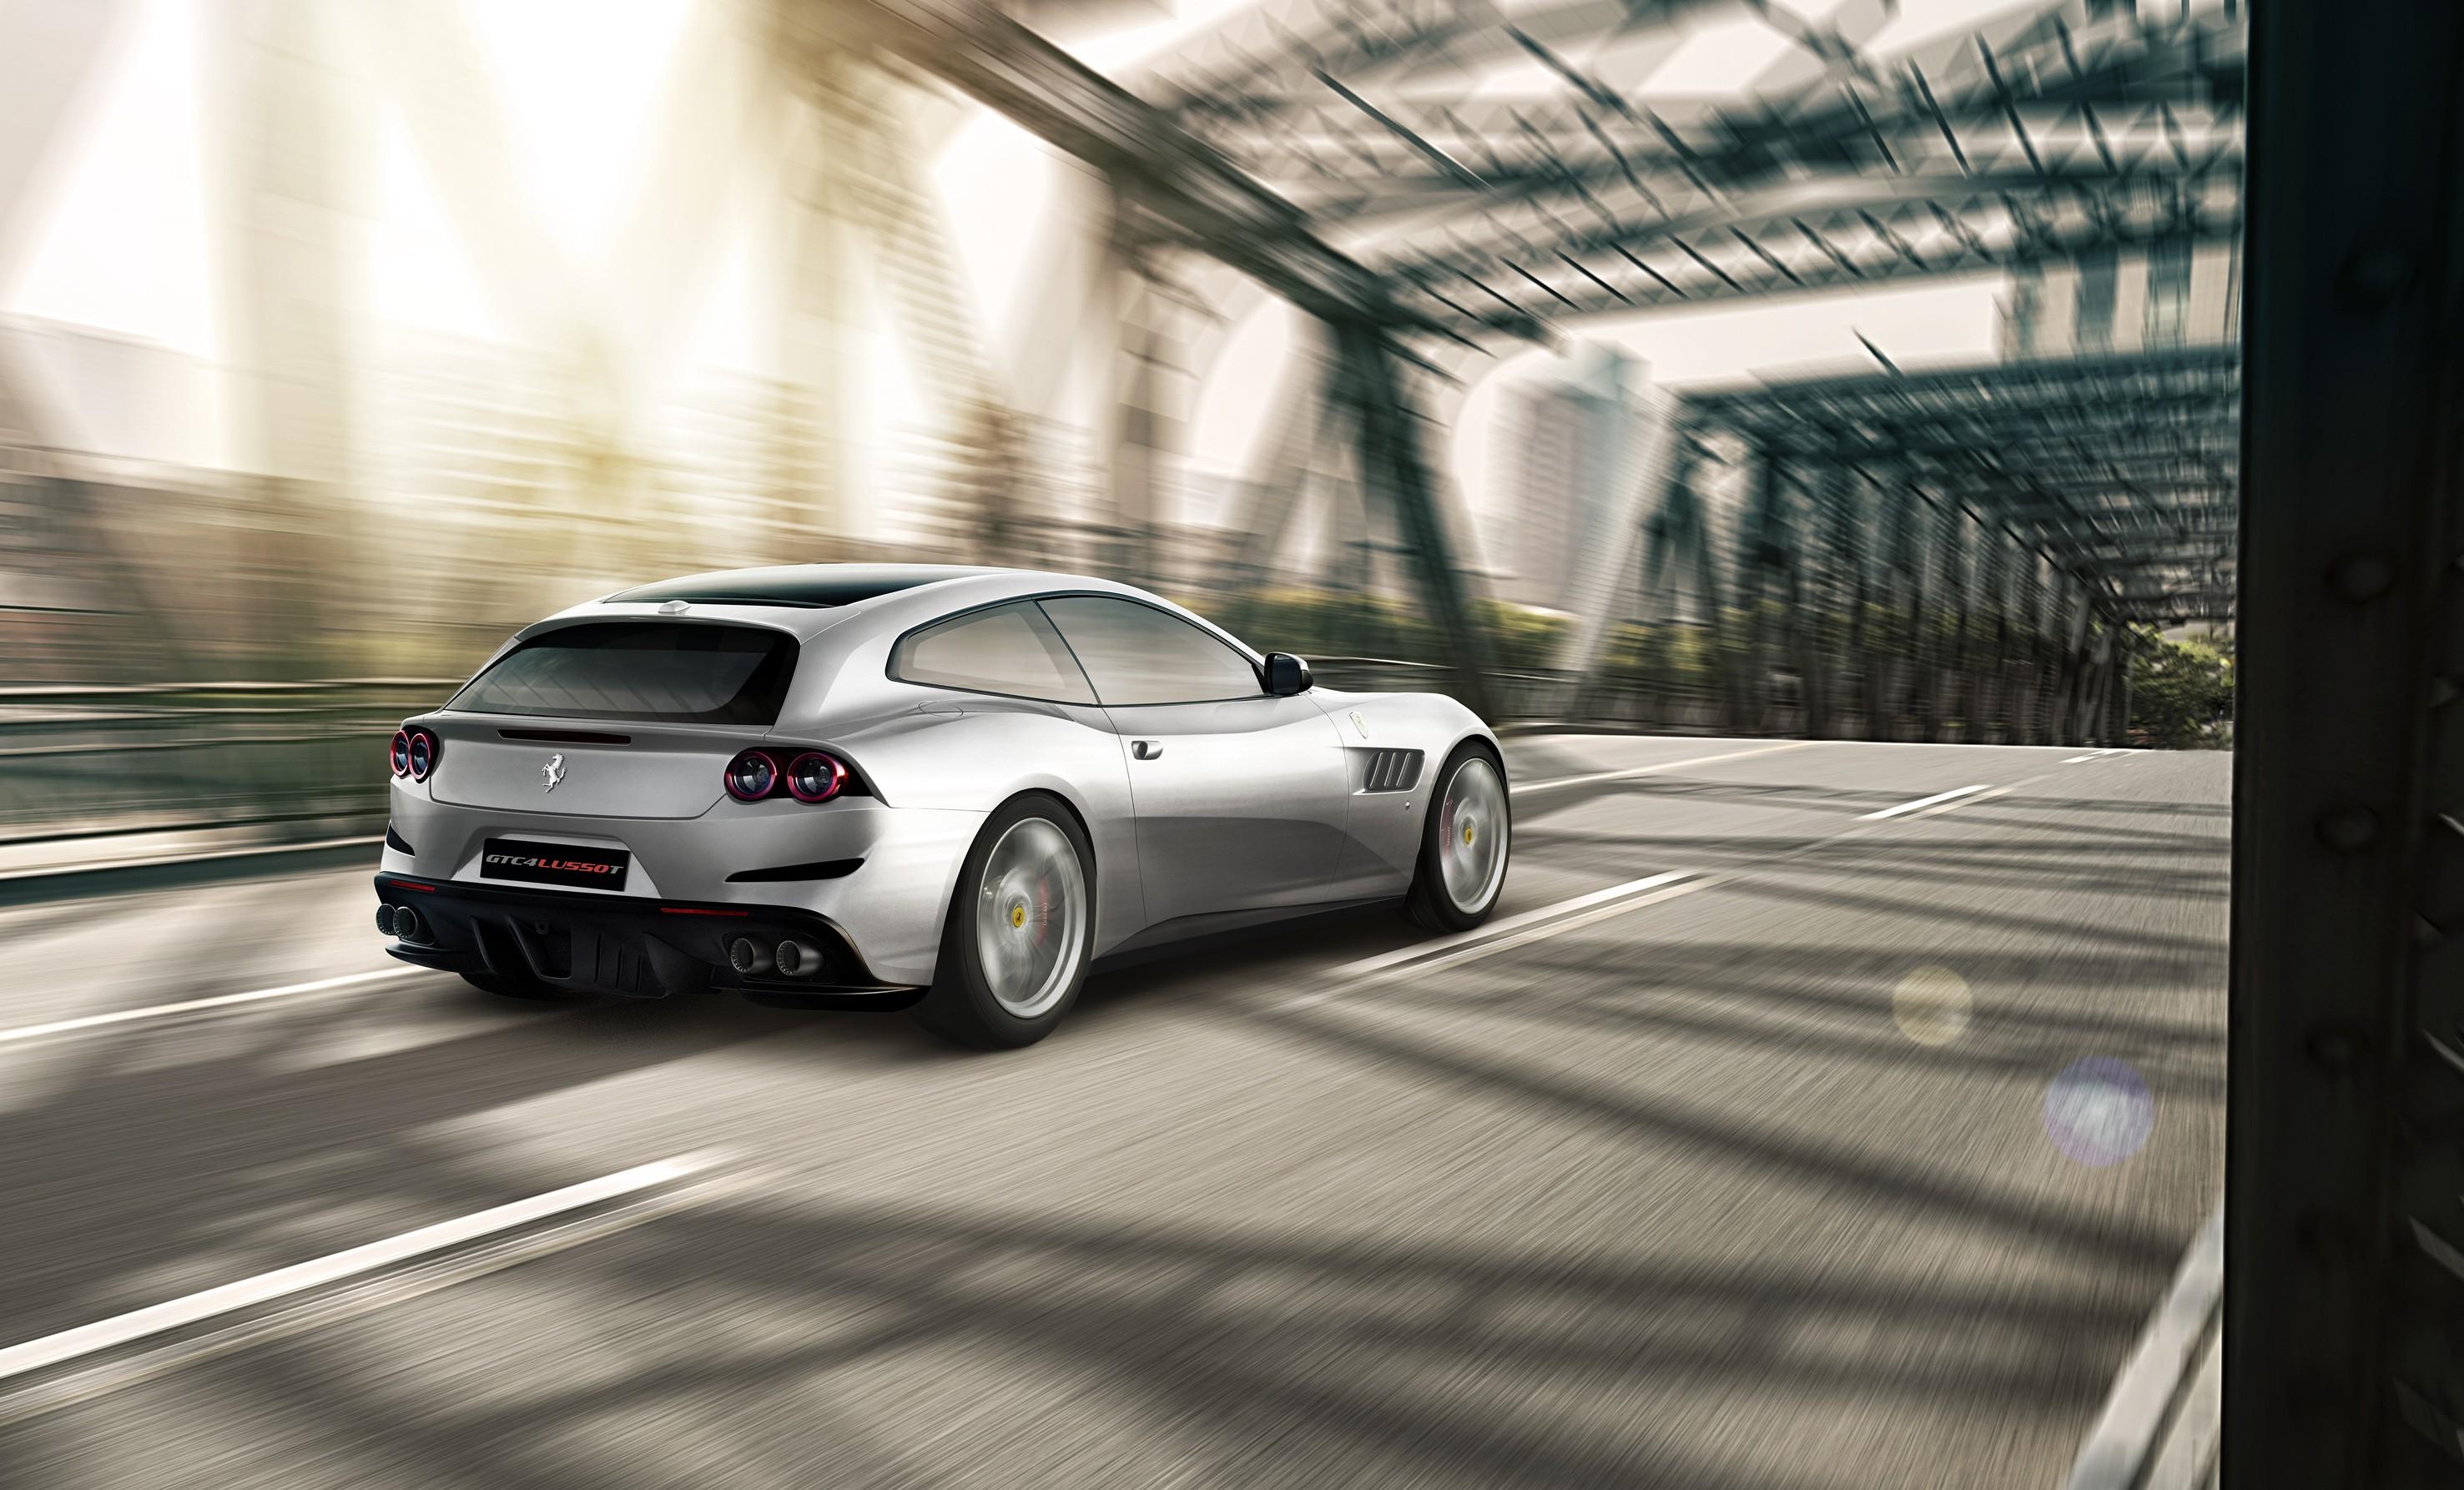 list car repair store brand ferrari specialty cars new en used data detail carstock sale stock